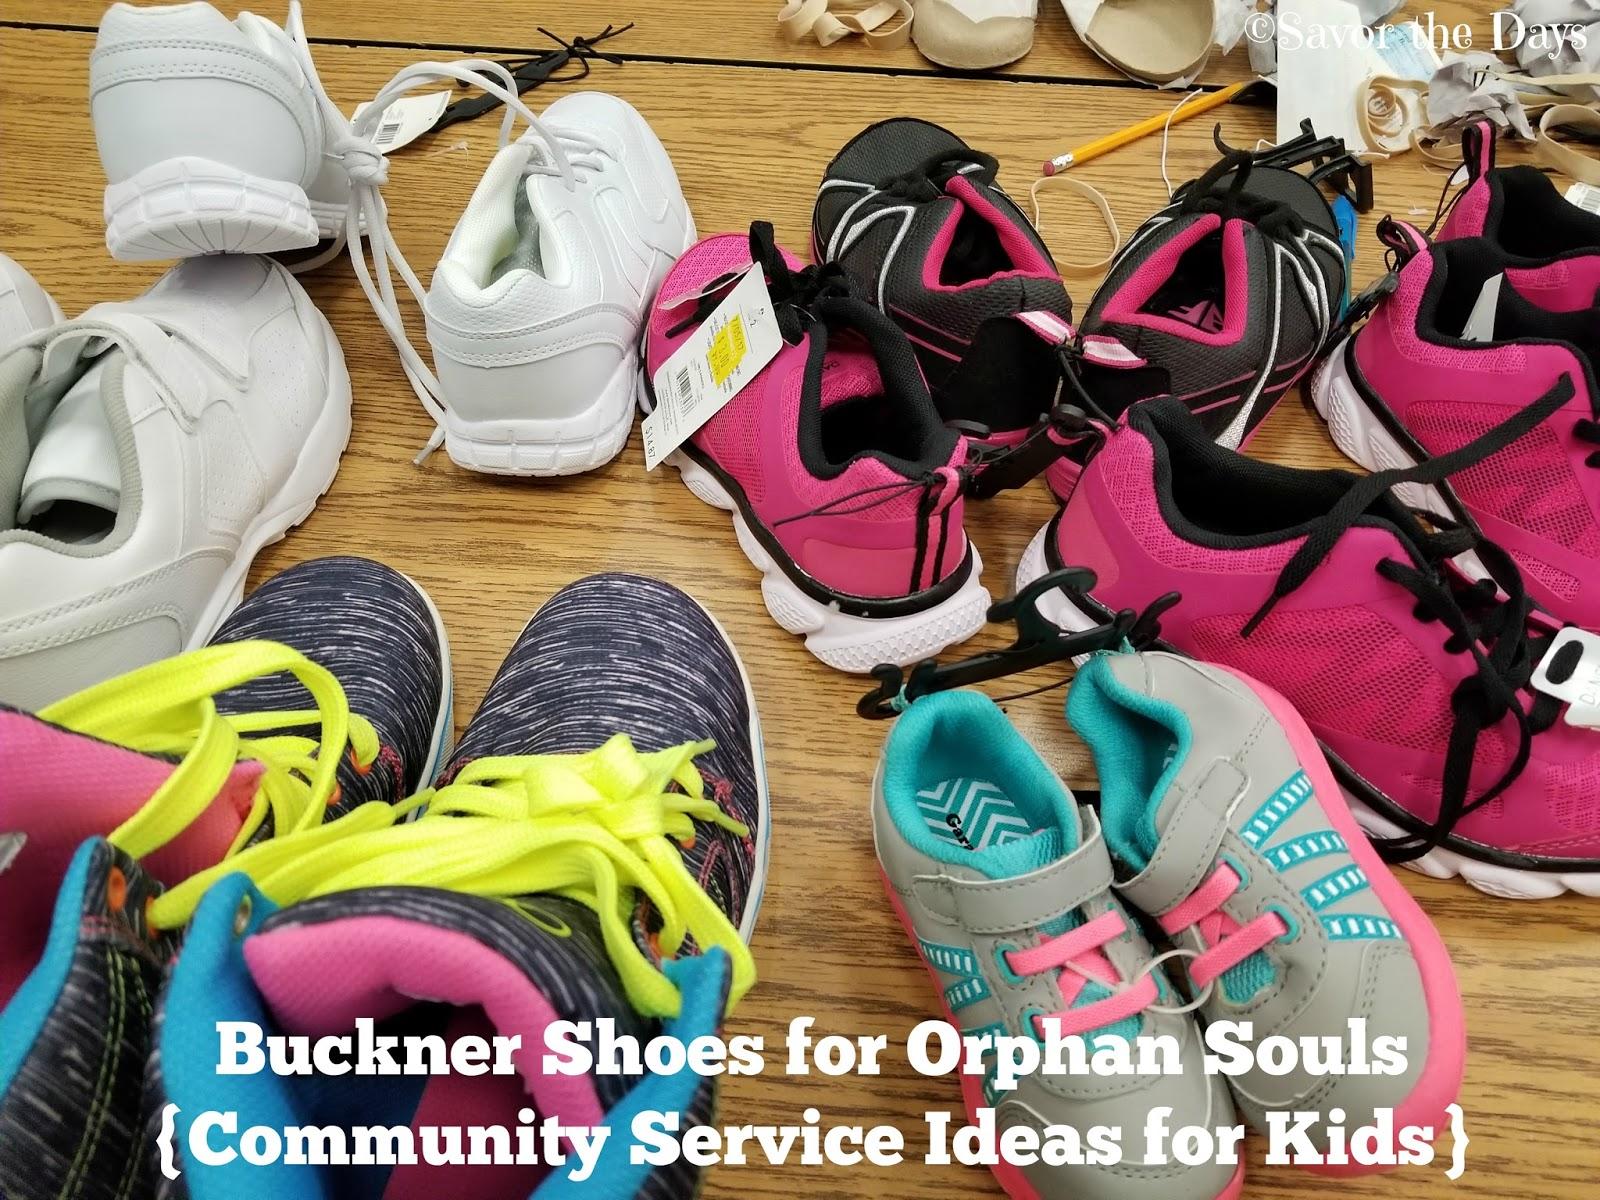 savor the days: buckner shoes for orphan souls {community service